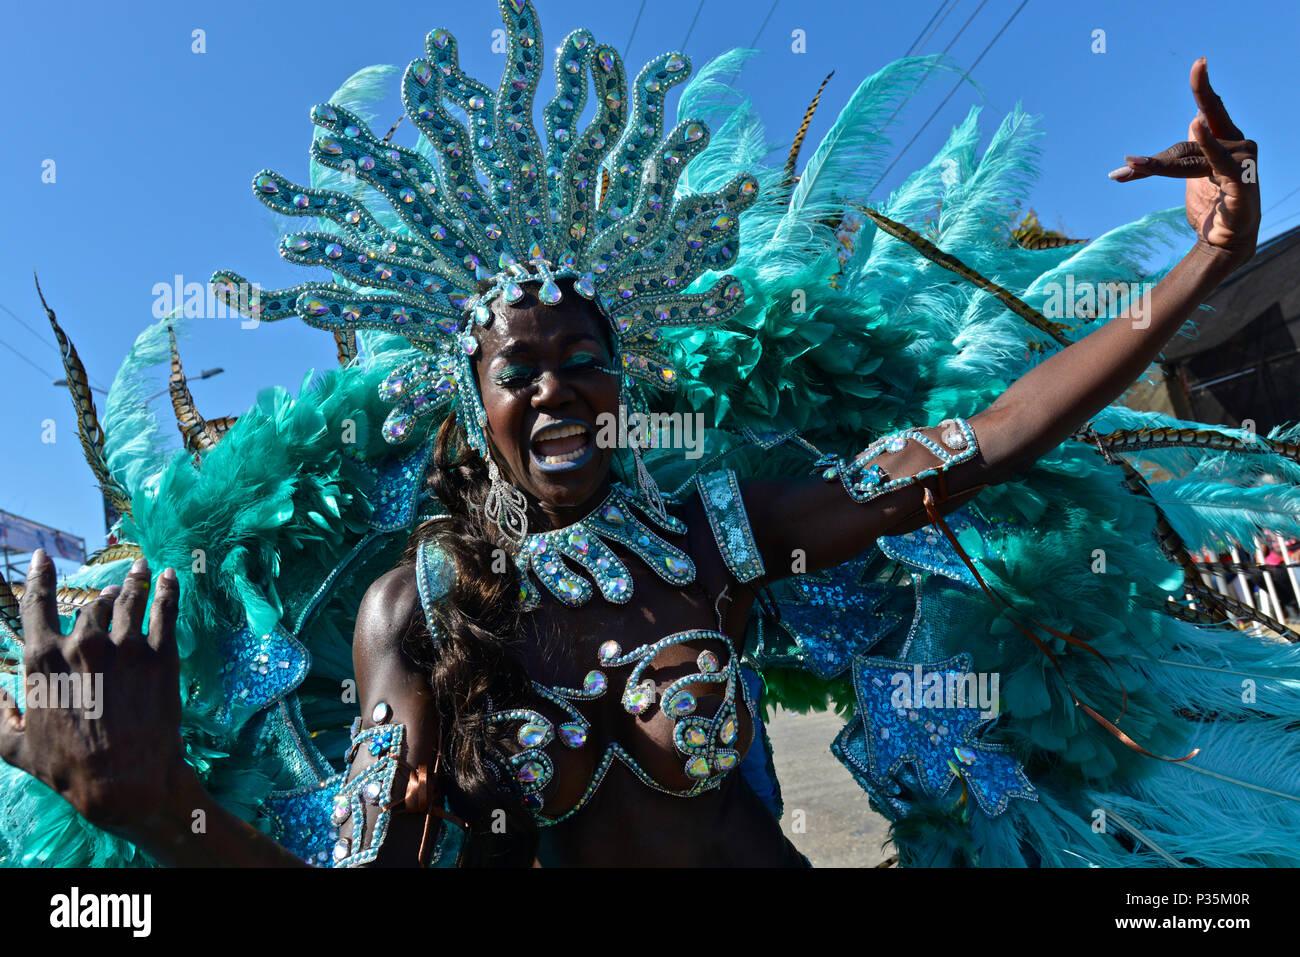 La batalla de flores, el Carnaval de Barranquilla. Foto de stock